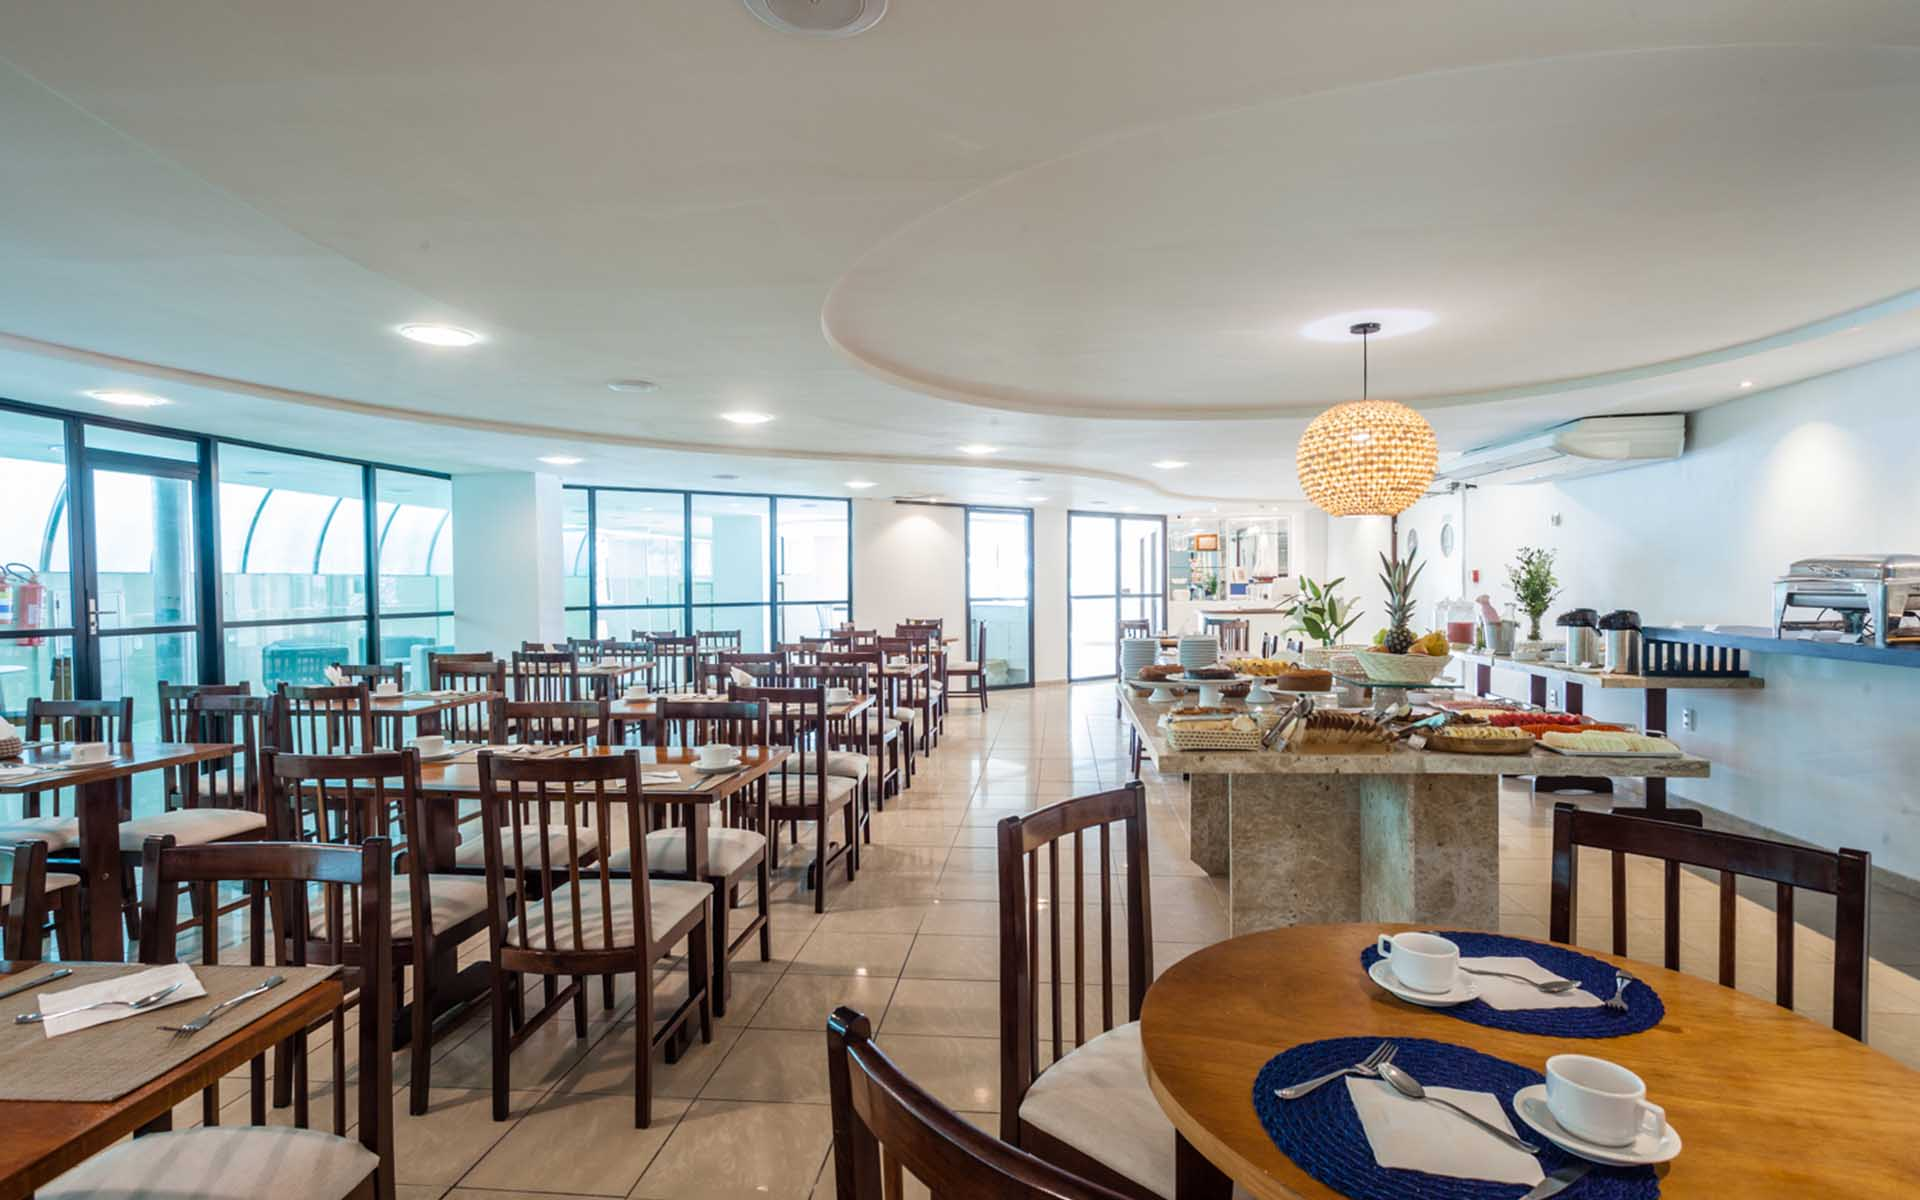 restaurante_hotel_joao_pessoa_hplus_beach (4)